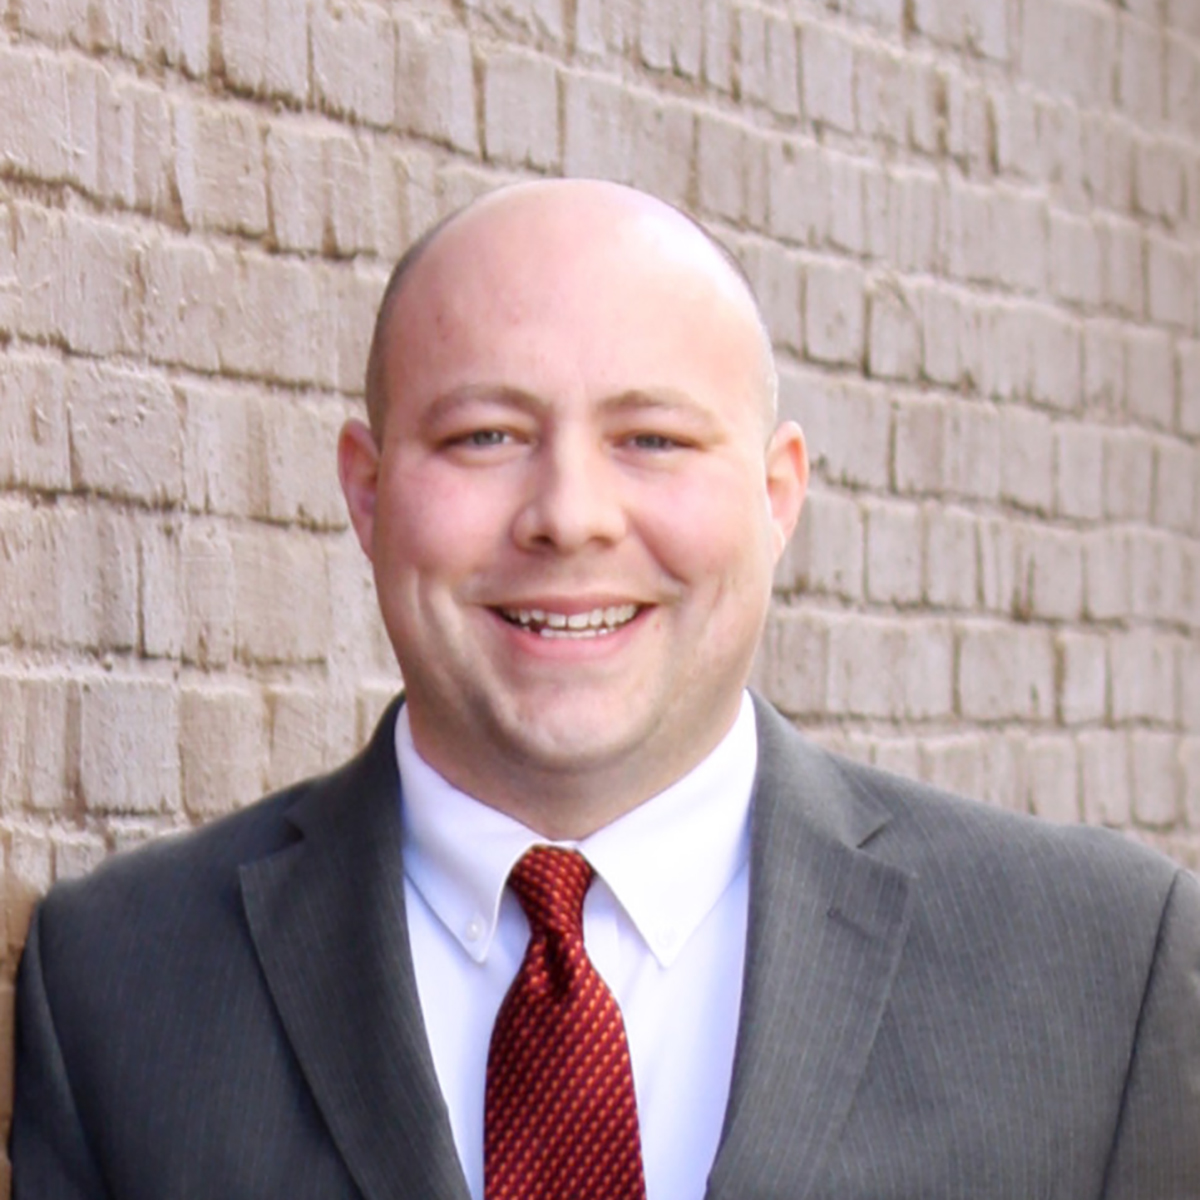 Representative Cody Smith